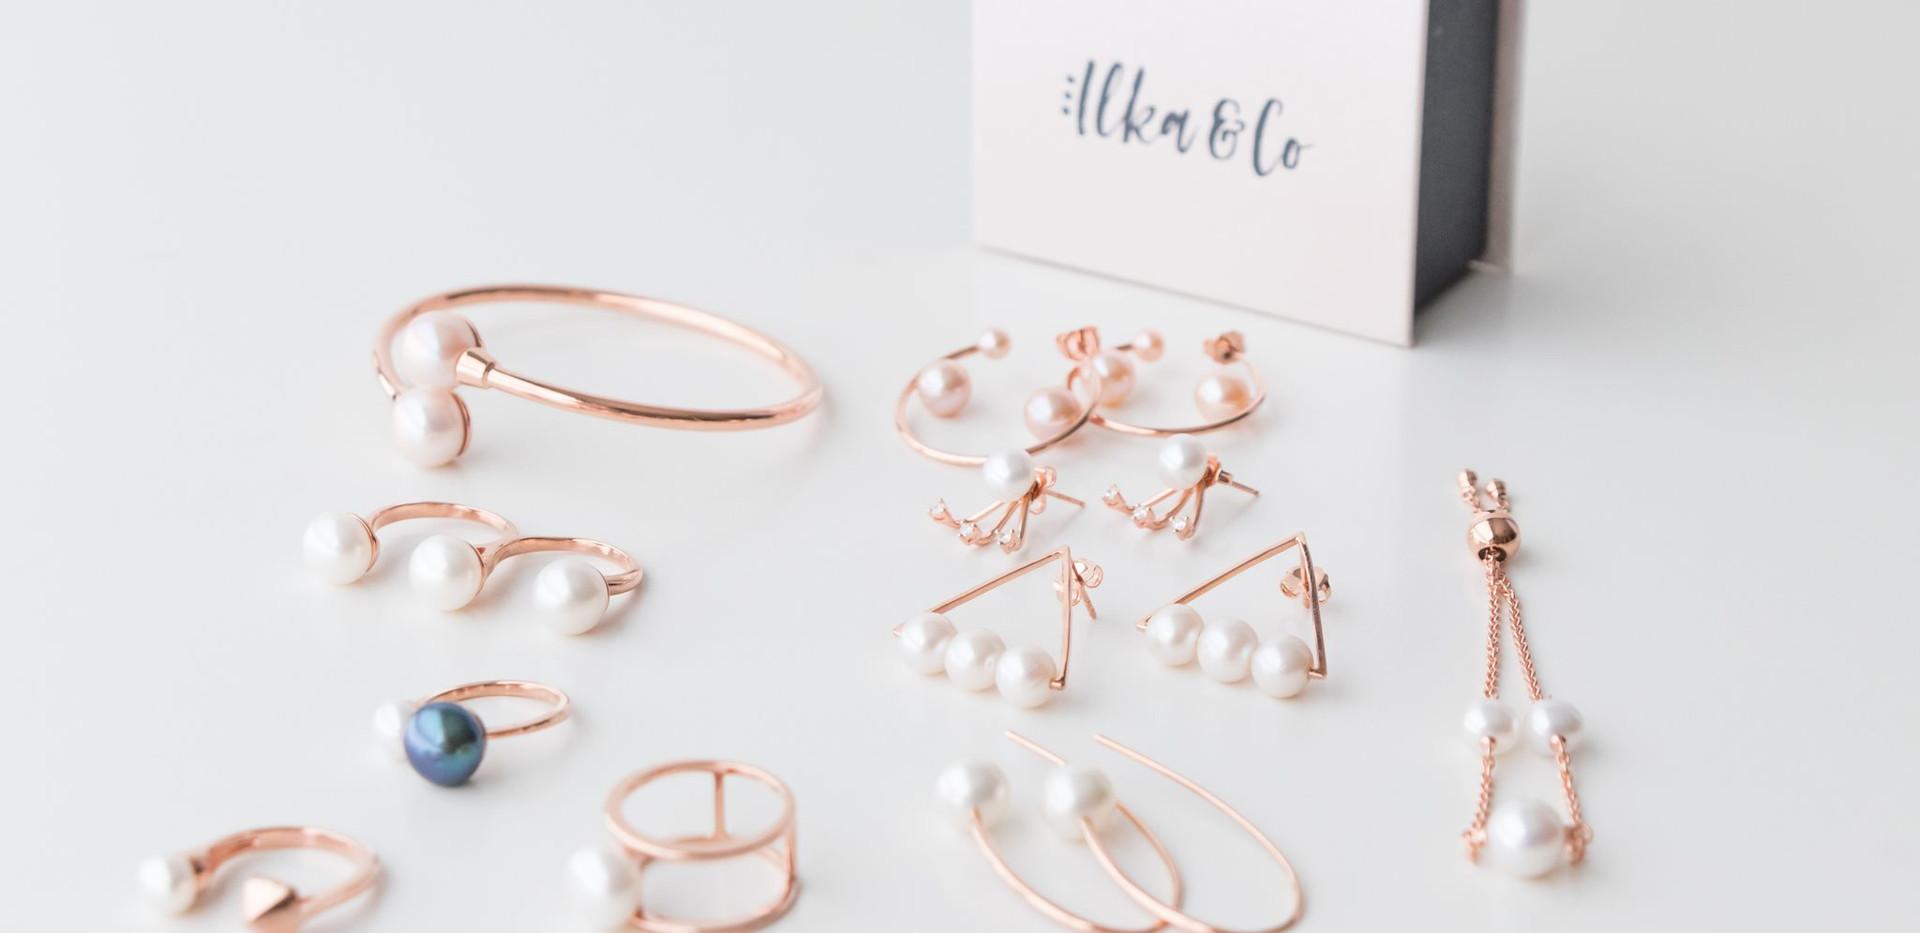 Ilka and Co Jewelery 1.jpg